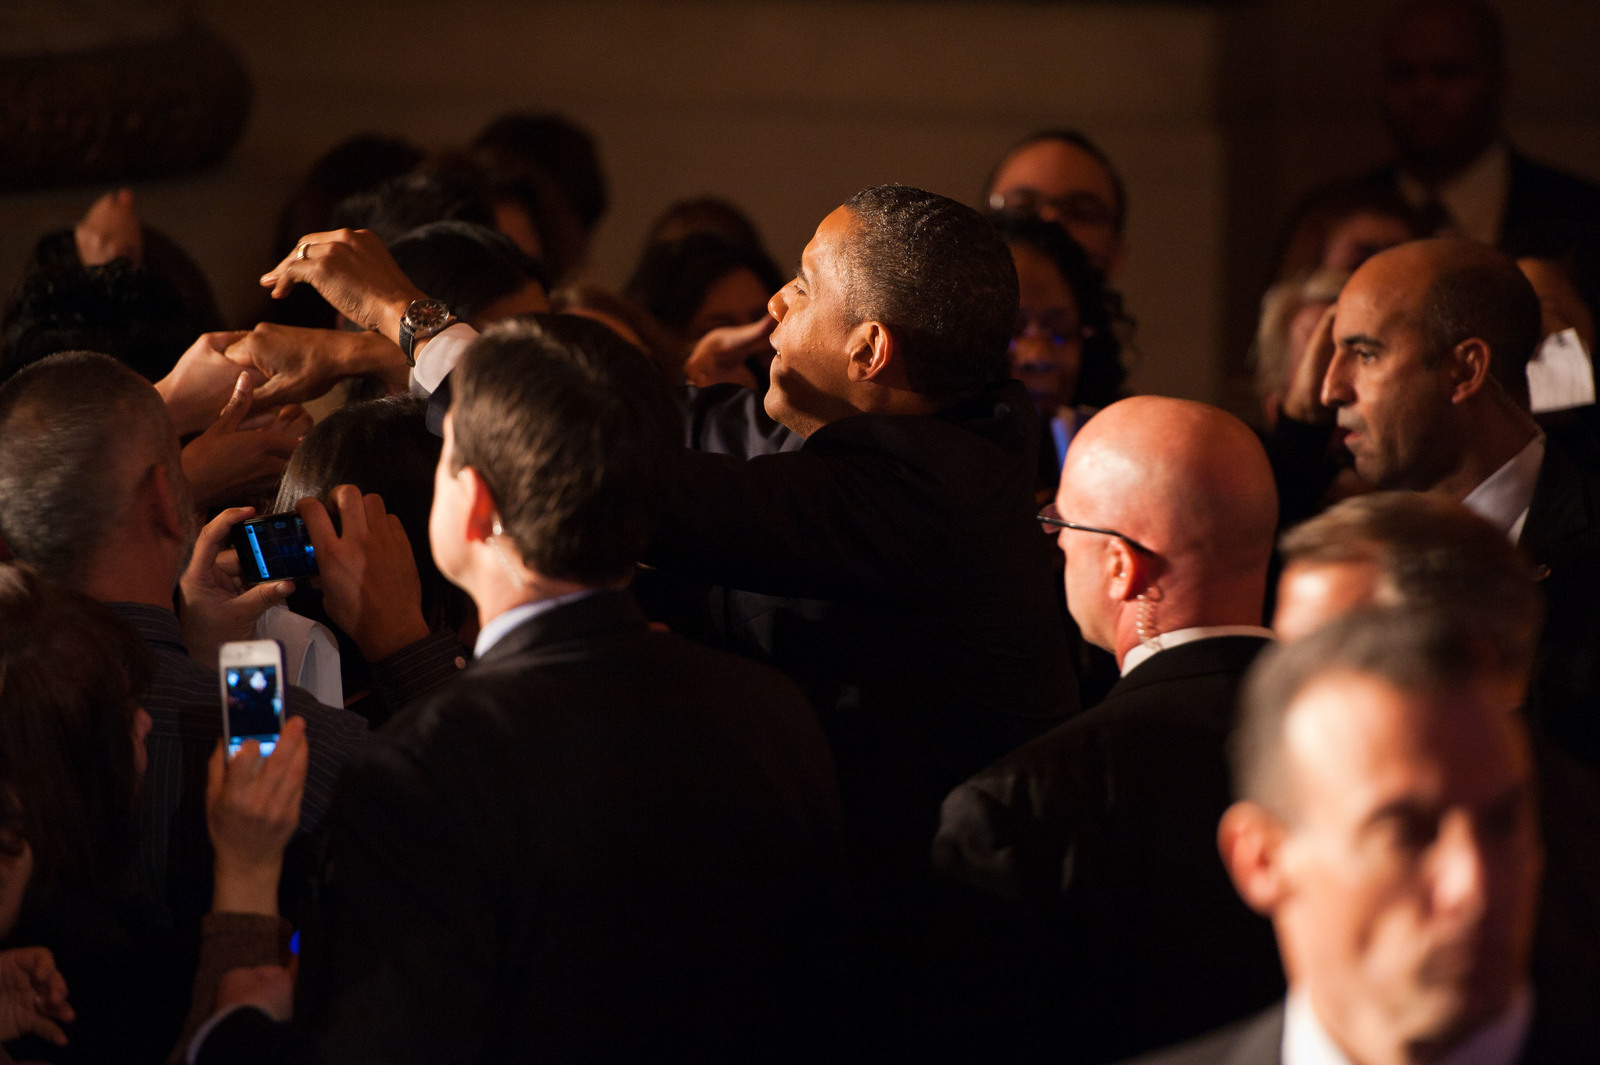 Office of the Administrator - President Obama [412-APD-1097-2012-12-10_PresidentObama_179.jpg]